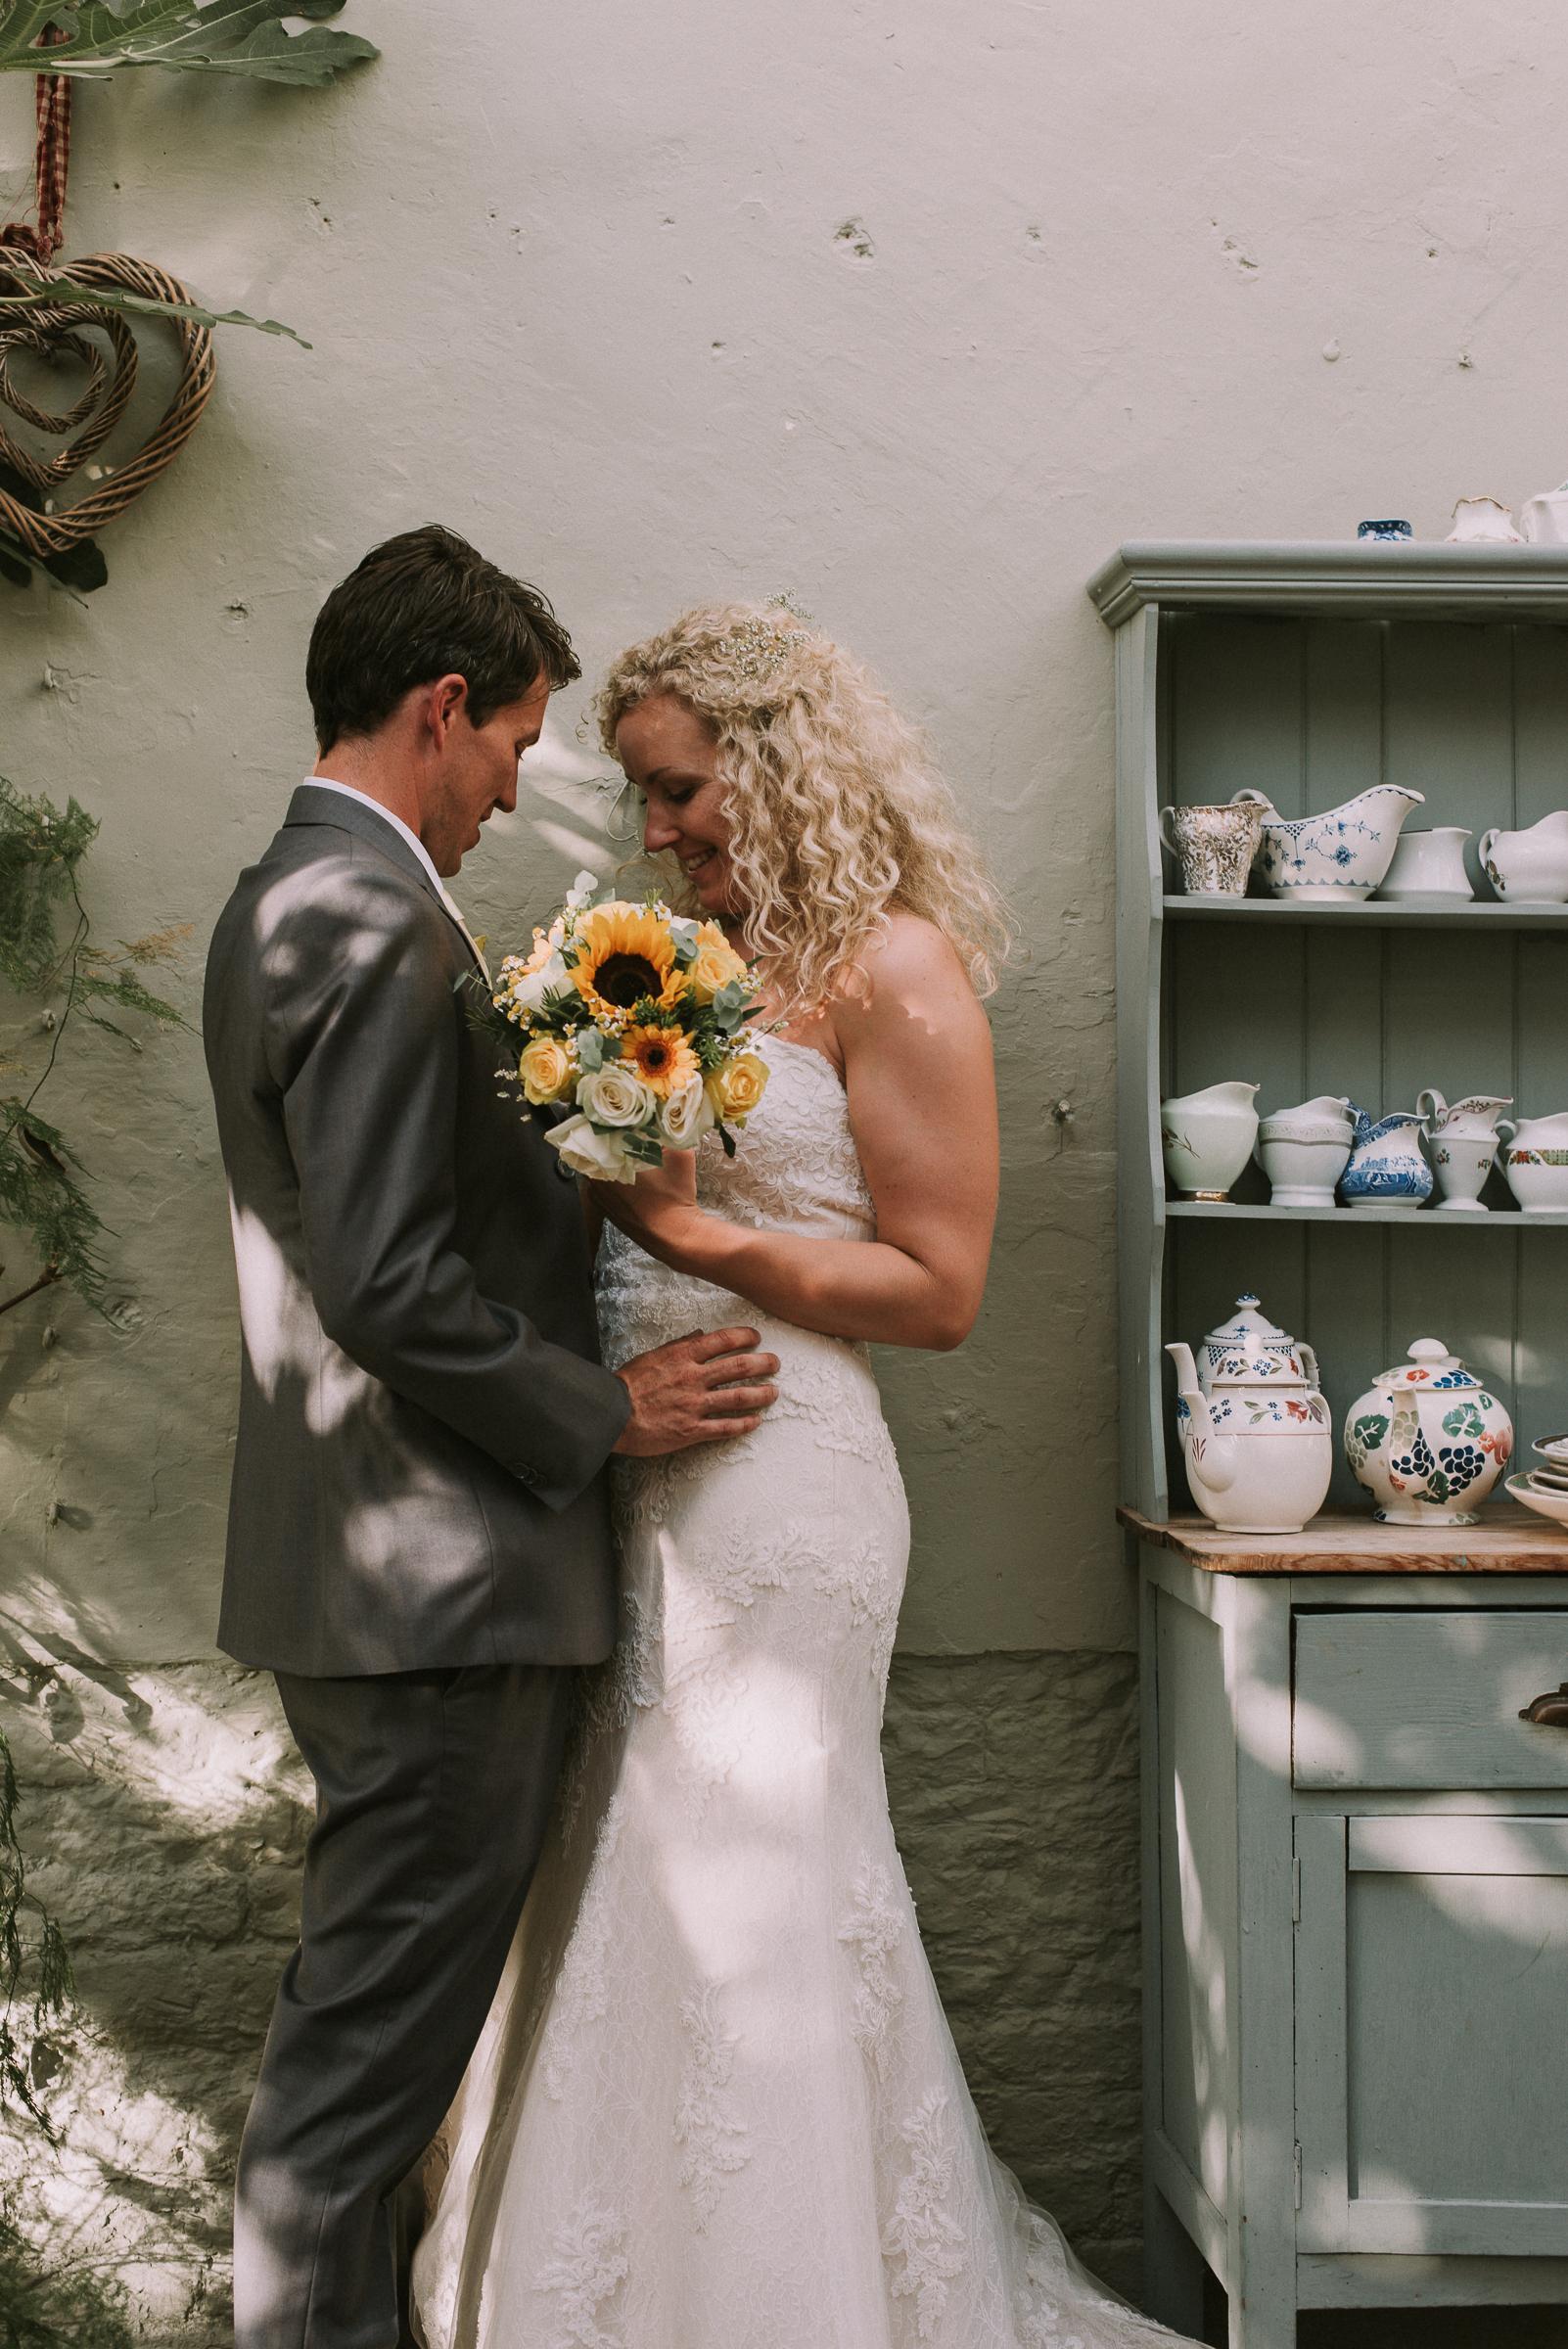 Festival Wedding Photography Secret Garden Maidstone Kent Jay Tunbridge Photorgaphic Co-42.jpg